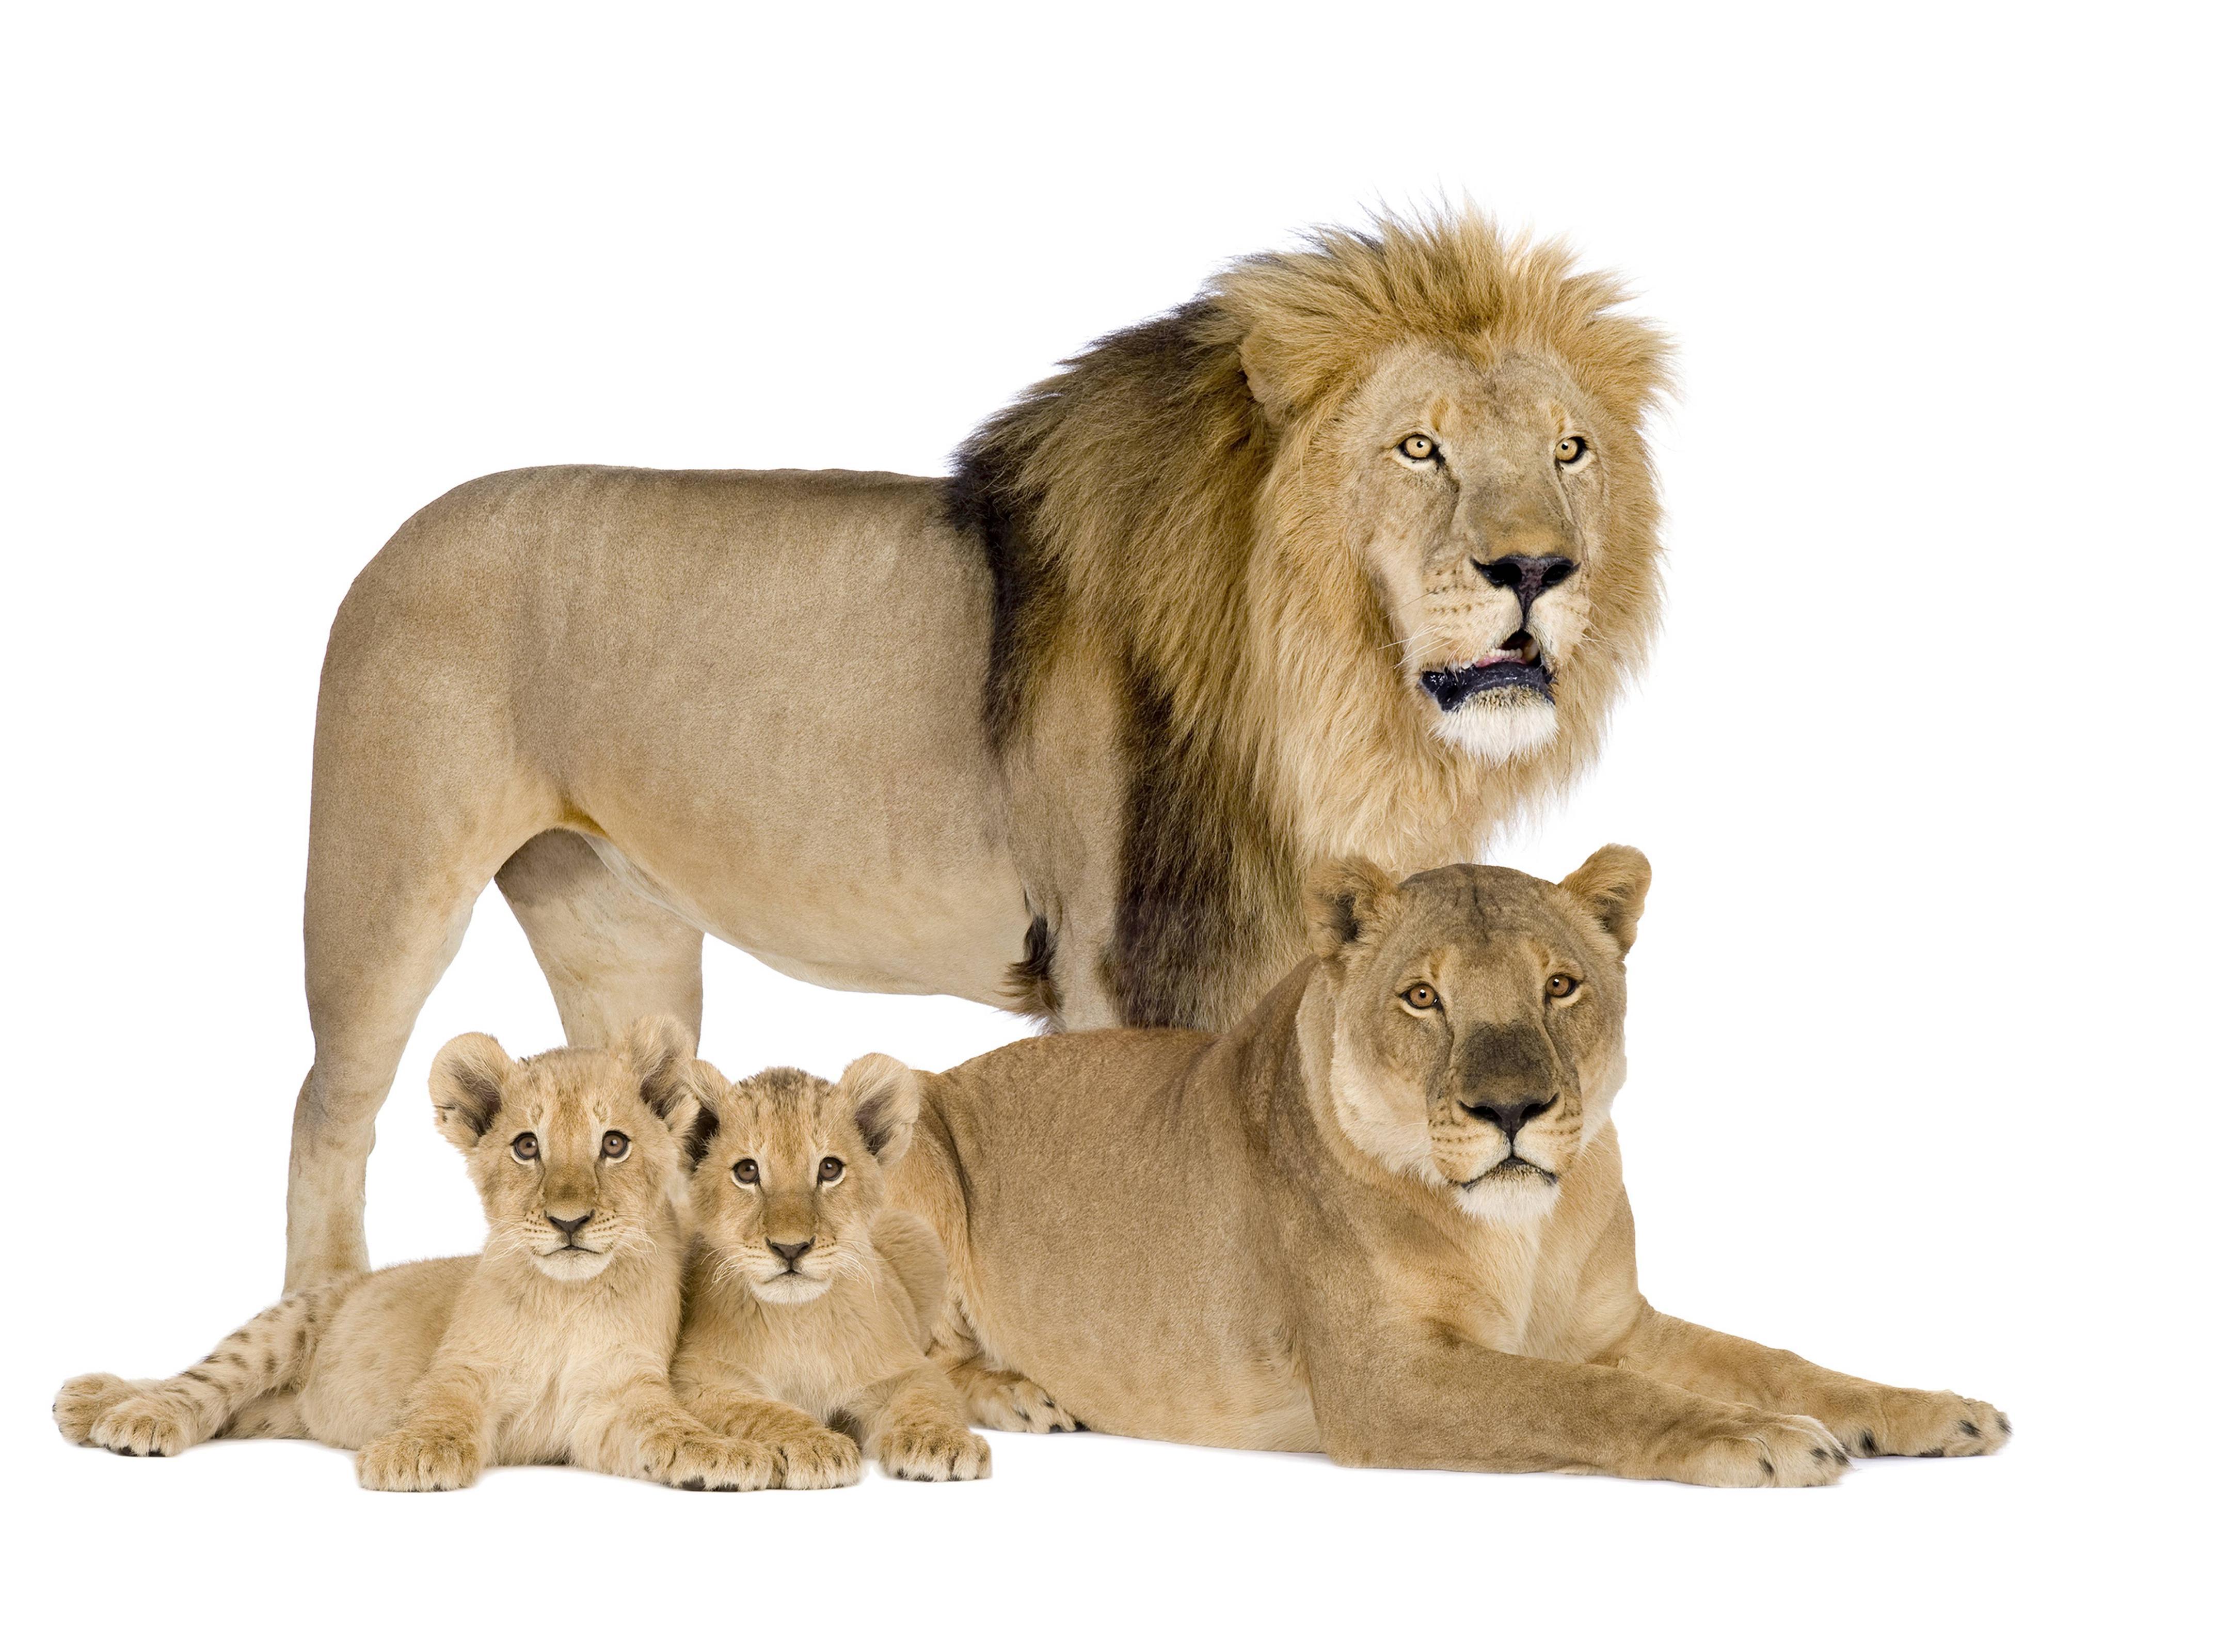 Lion family wallpaper - photo#45